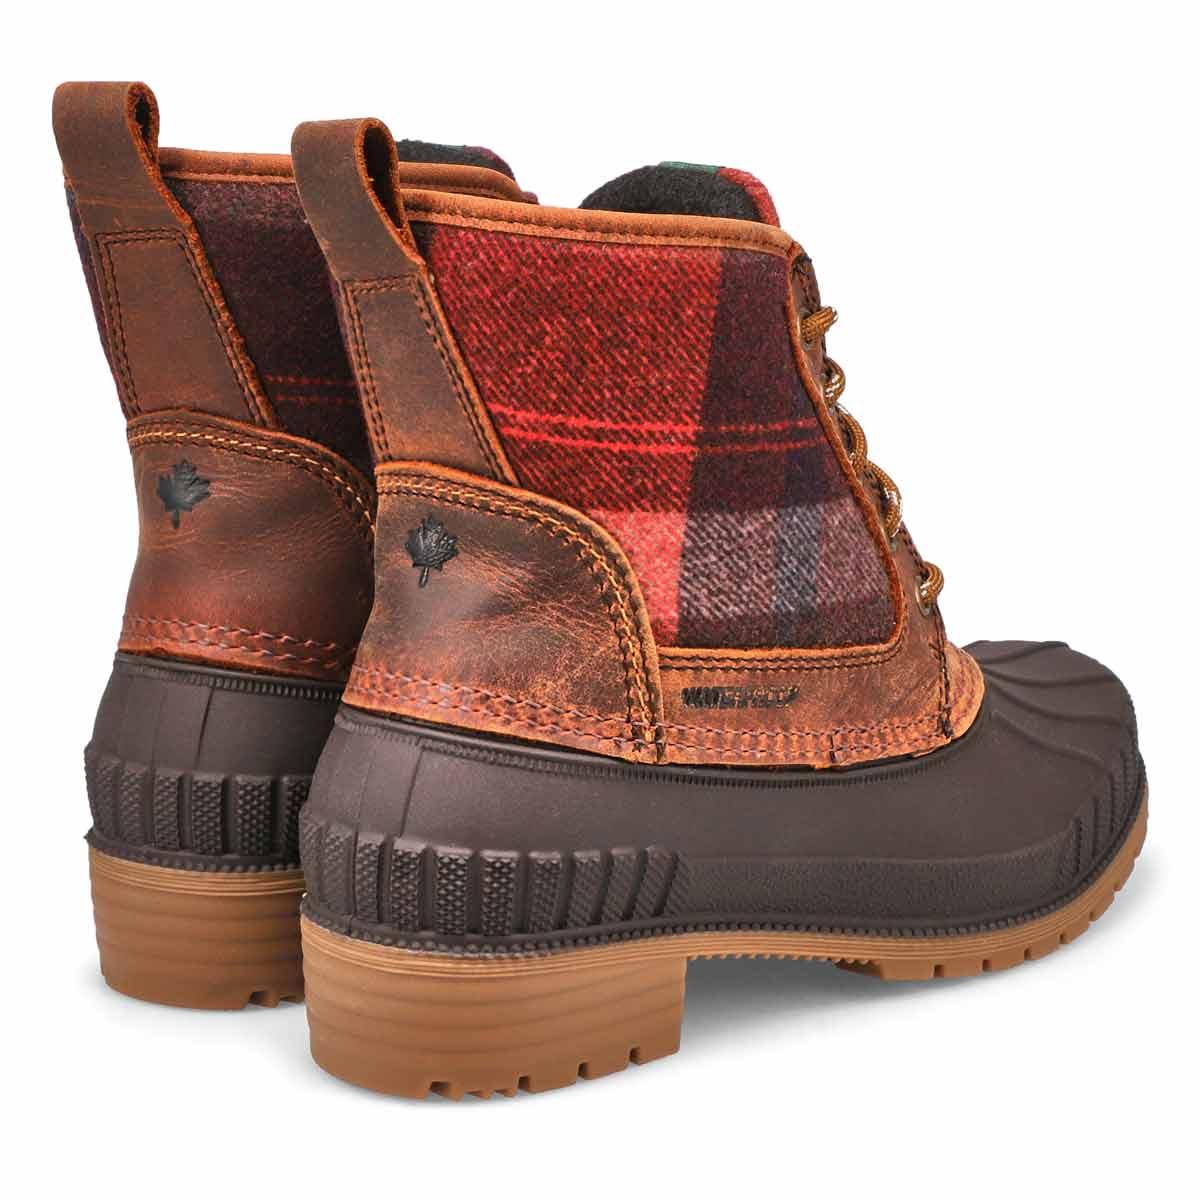 Women's Sienna Mid Waterproof Winter Boot - Brown